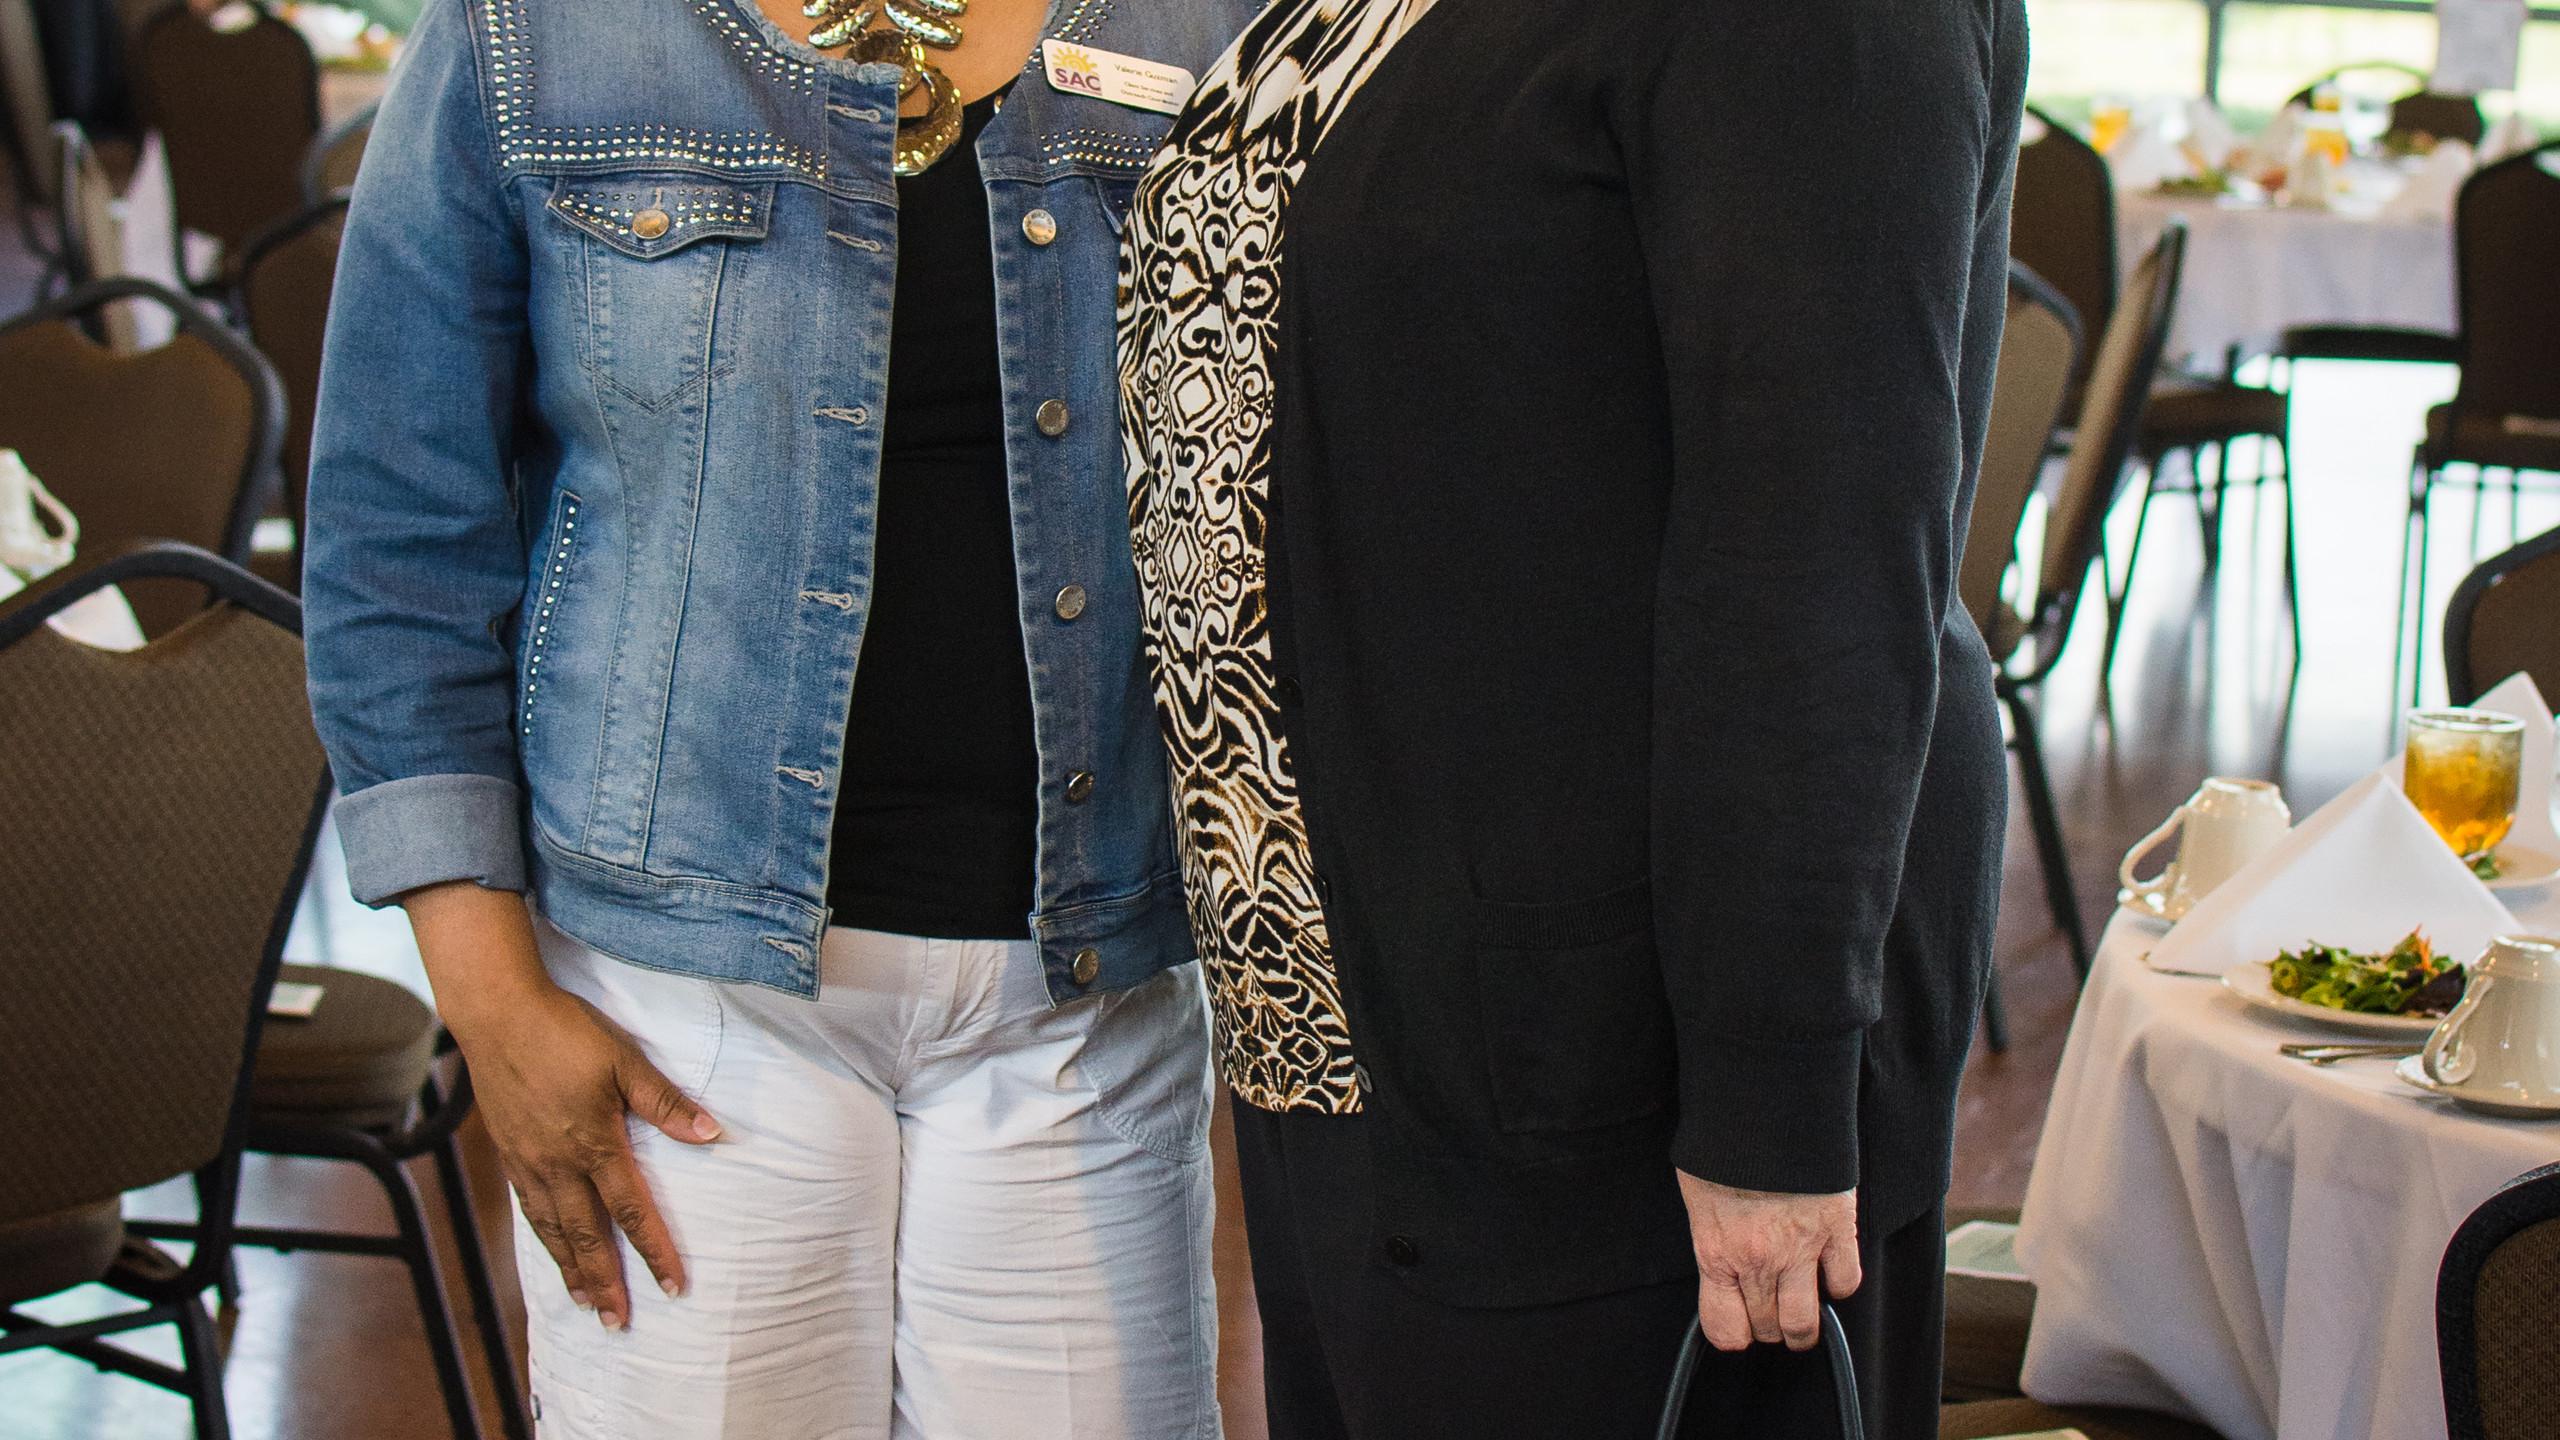 Valerie Guzman and Sonda Finley